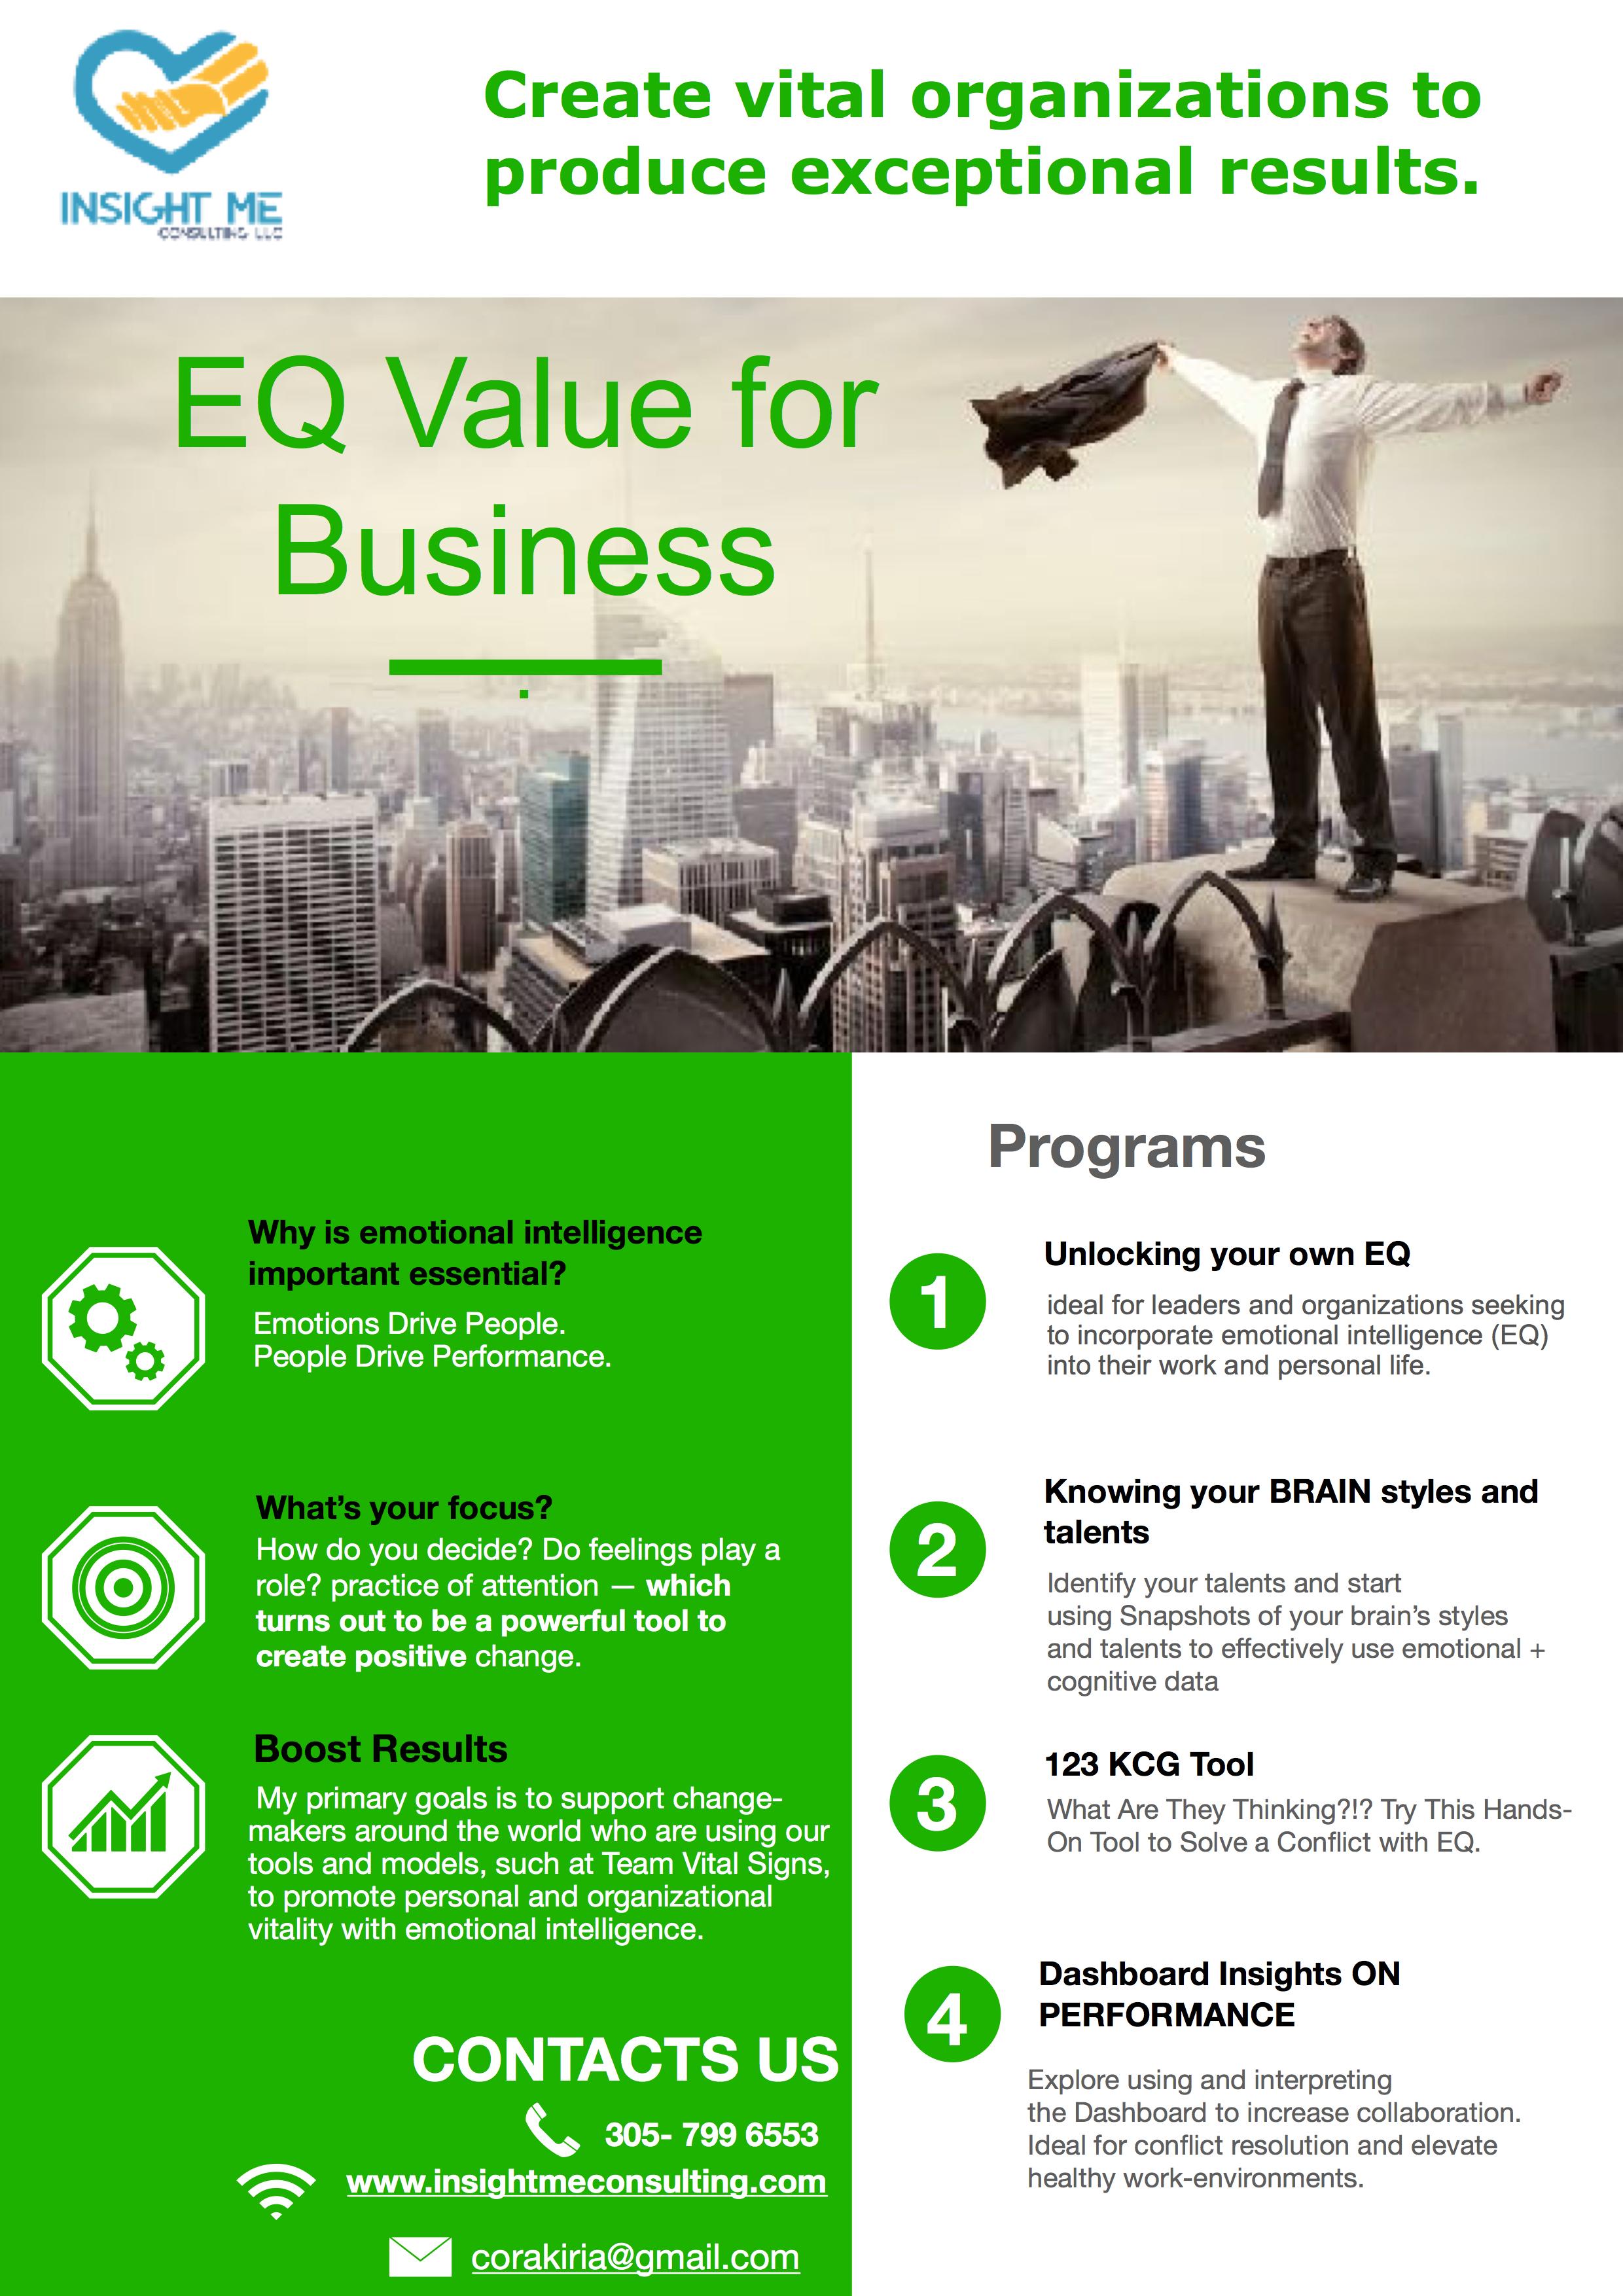 EQ Business Programs from Insight ME  JPG.jpg